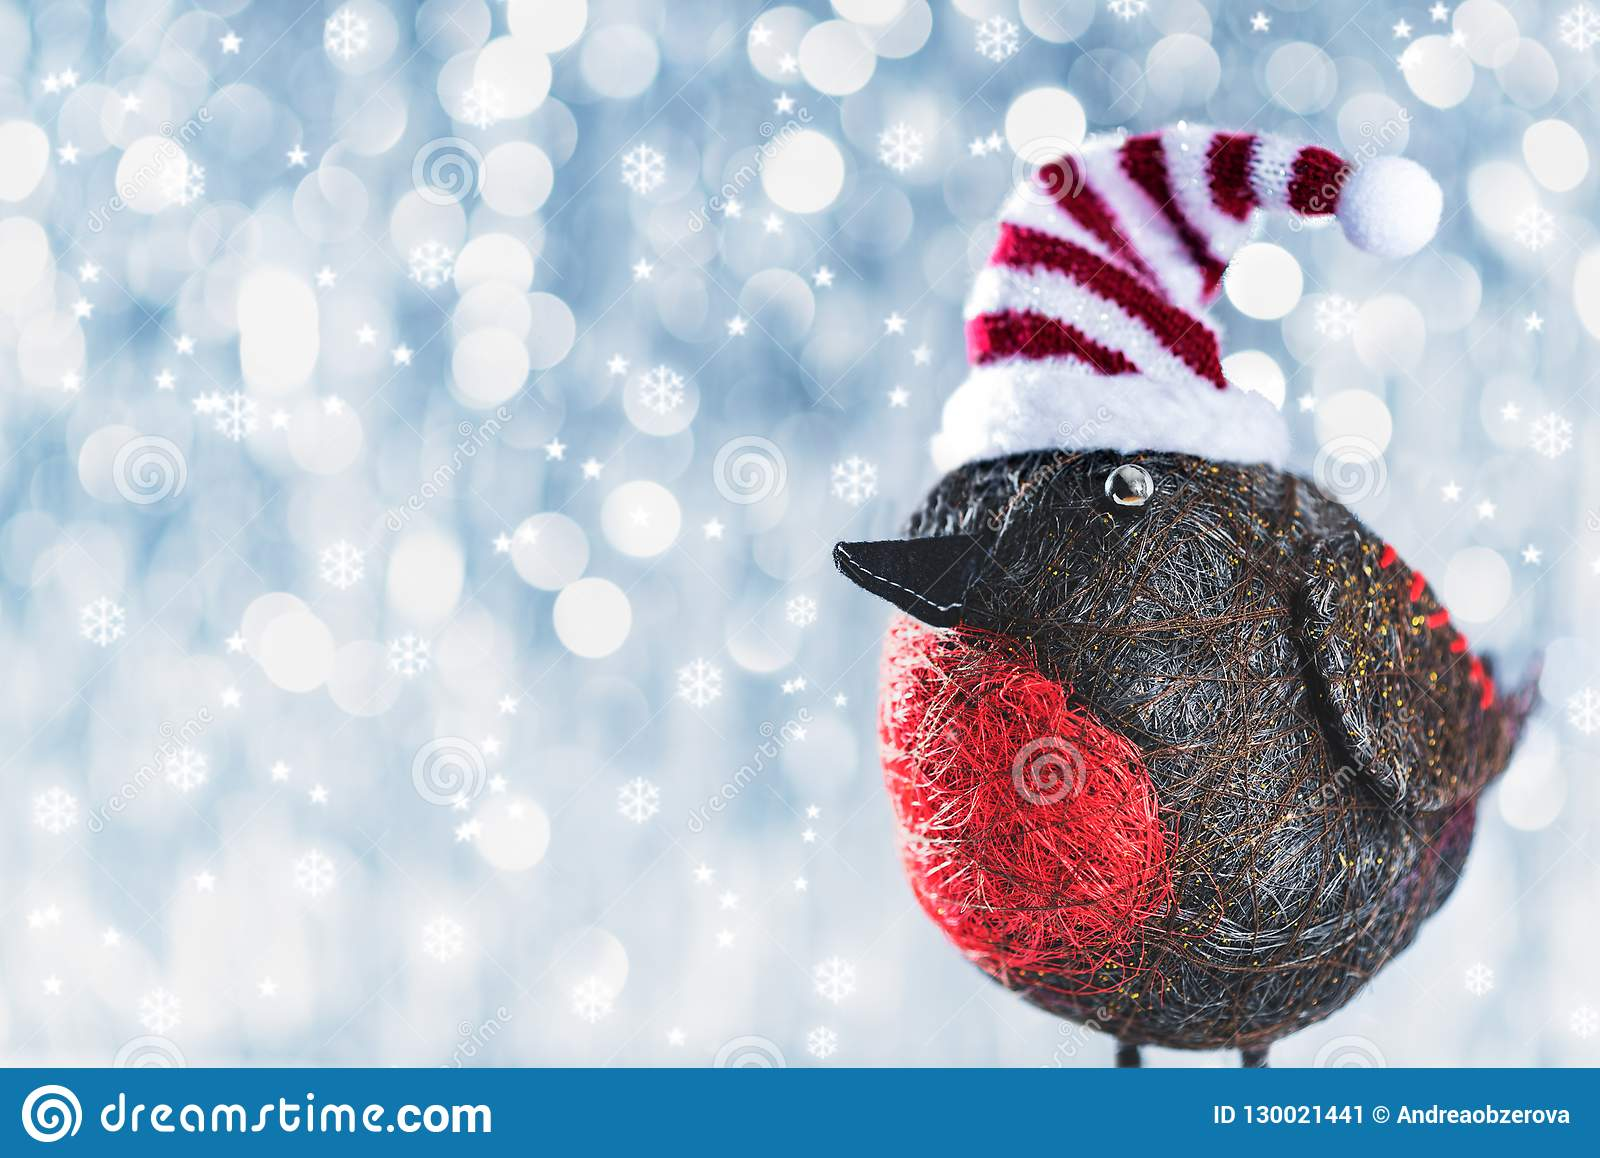 Cute Christmas Bird in Winter Wonderland. Christmas background.